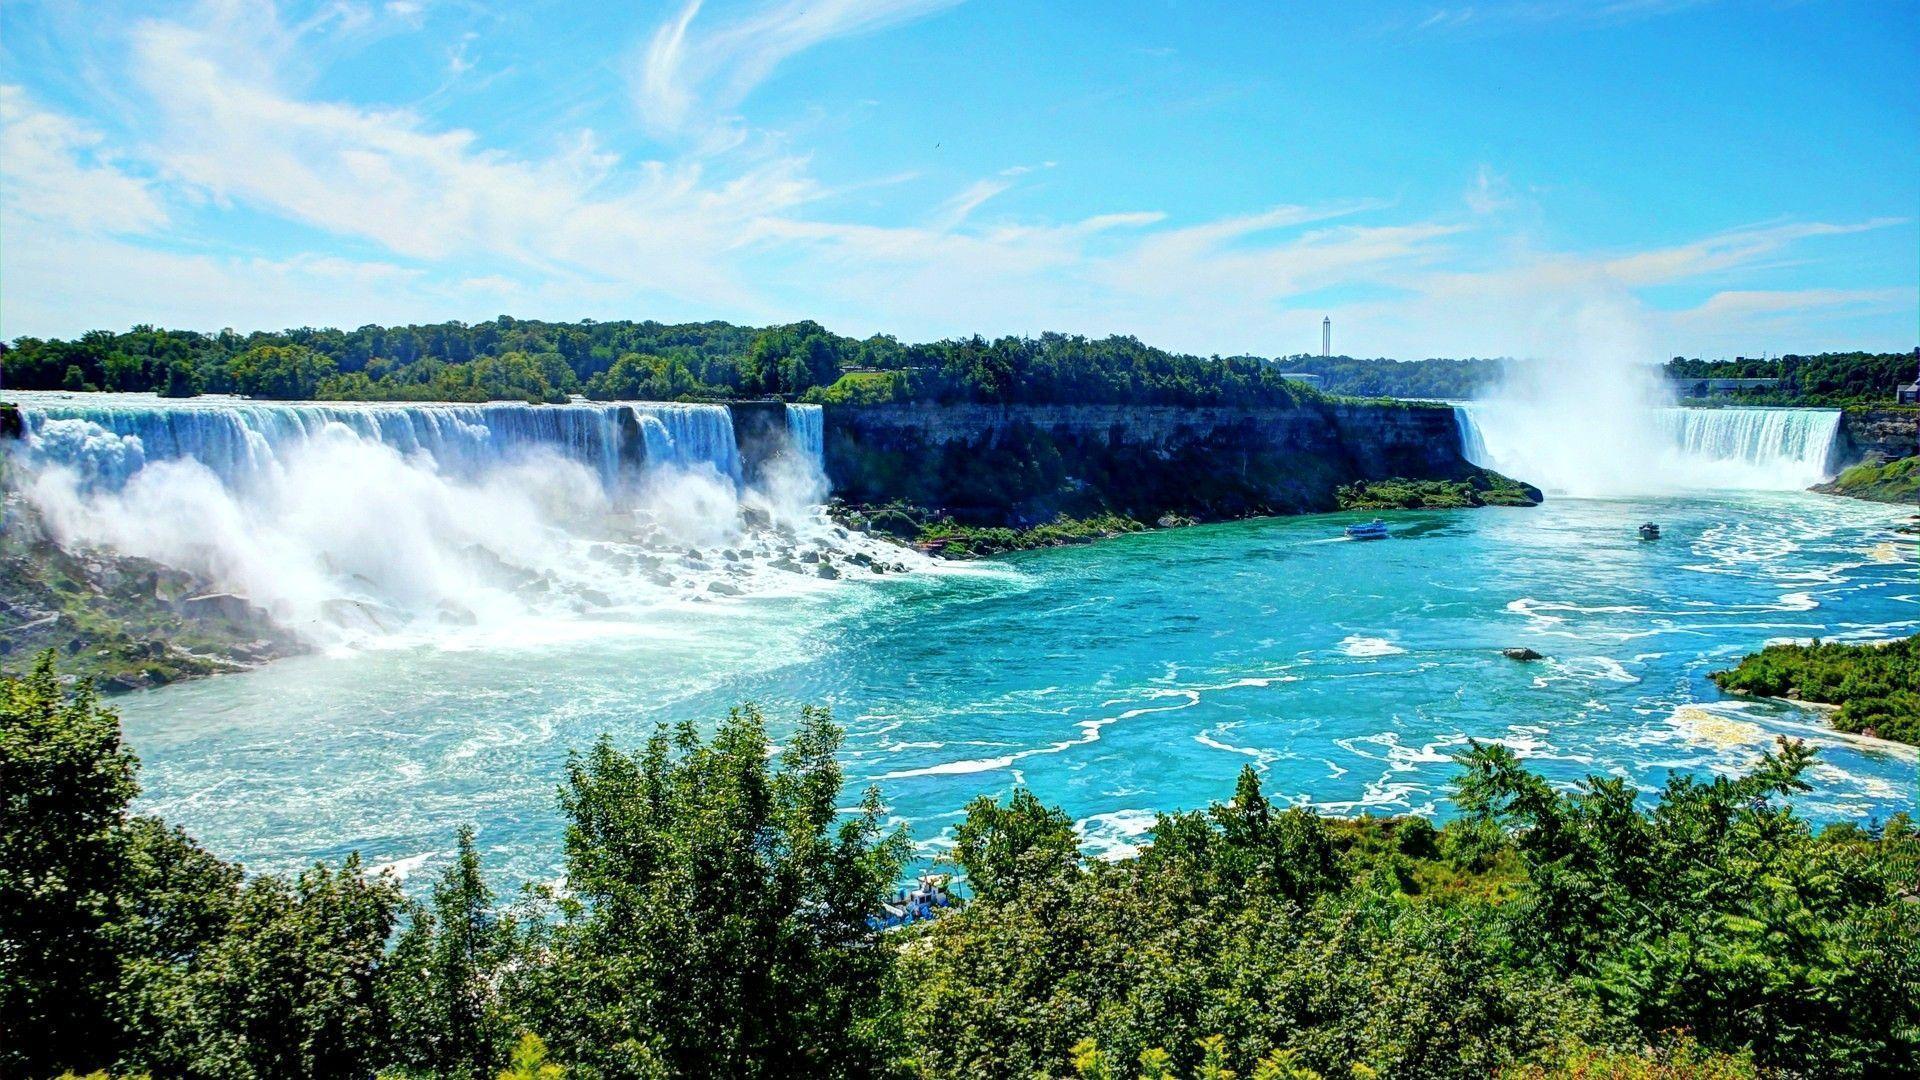 Niagara Falls Wallpaper 1366x768 Niagara Falls Wallpapers Wallpaper Cave